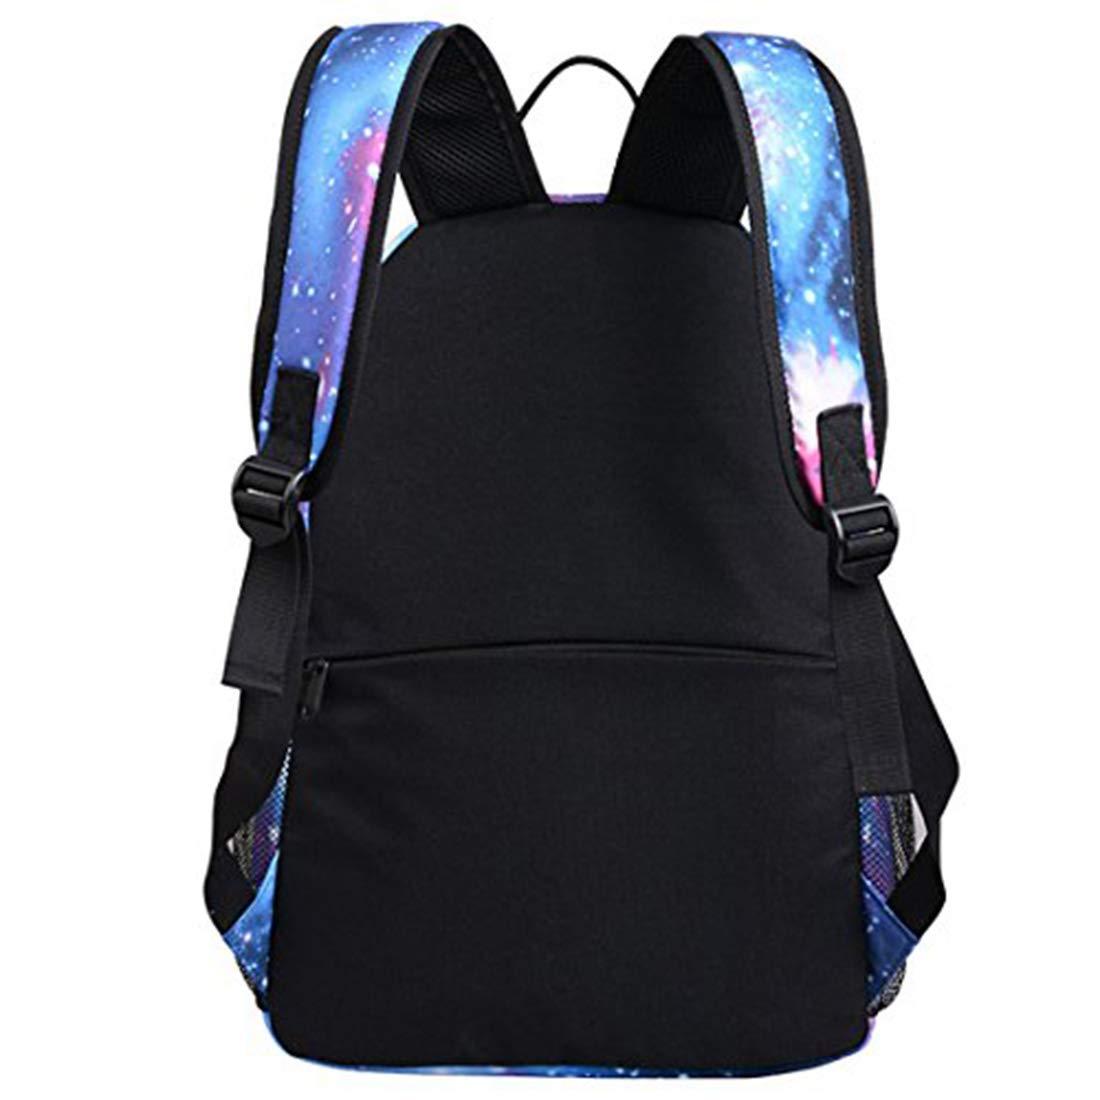 541f880f4f4e Luminous Backpack School Bags for Boys School Rucksack Laptop Backpack  Travel Bag